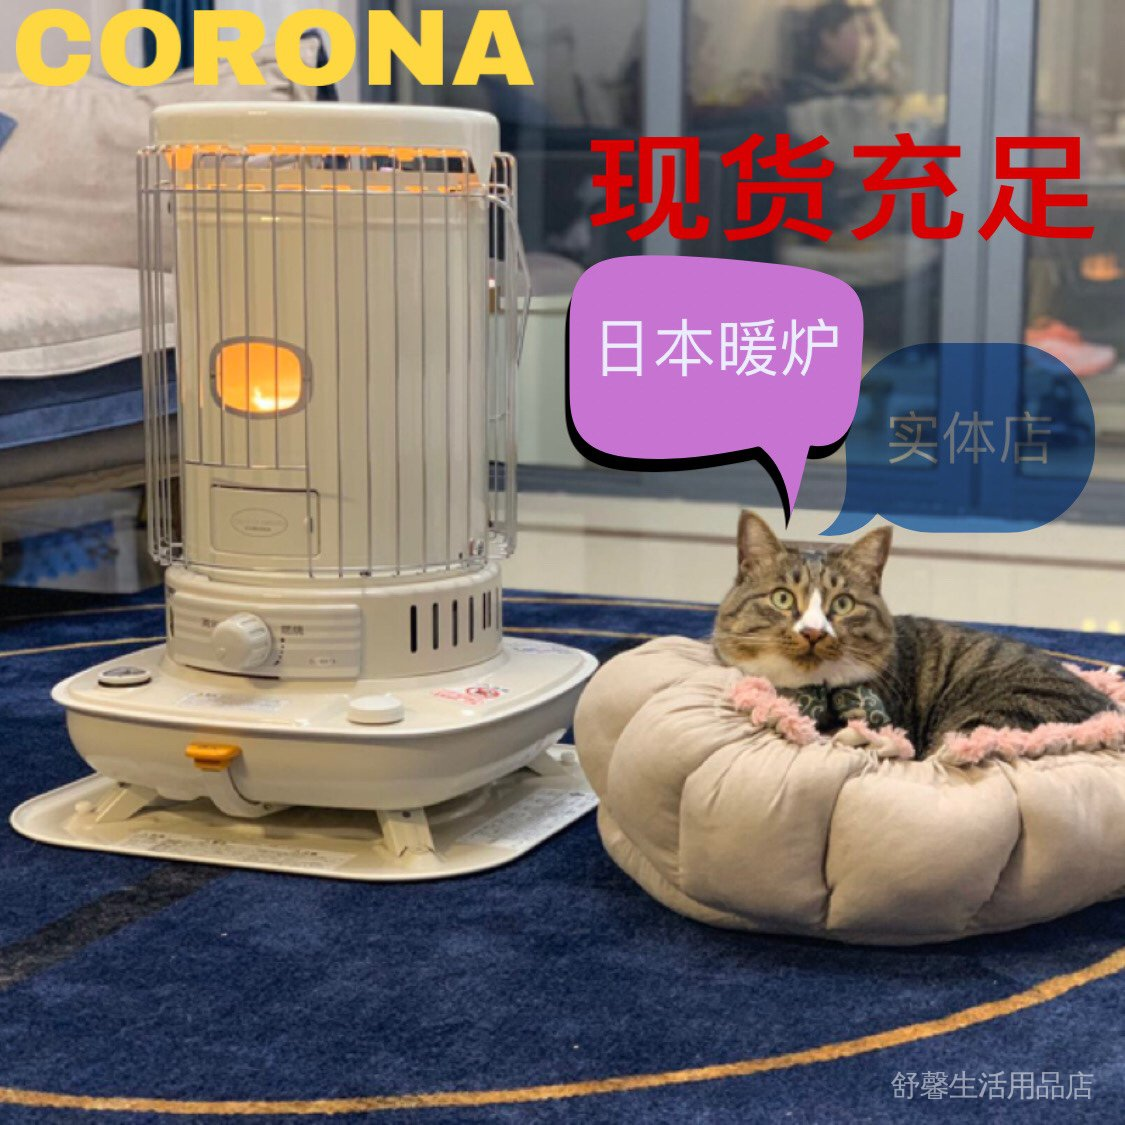 【220v】日本CORONA煤油爐6619新款SL6620取暖器家用露營燒烤戶外